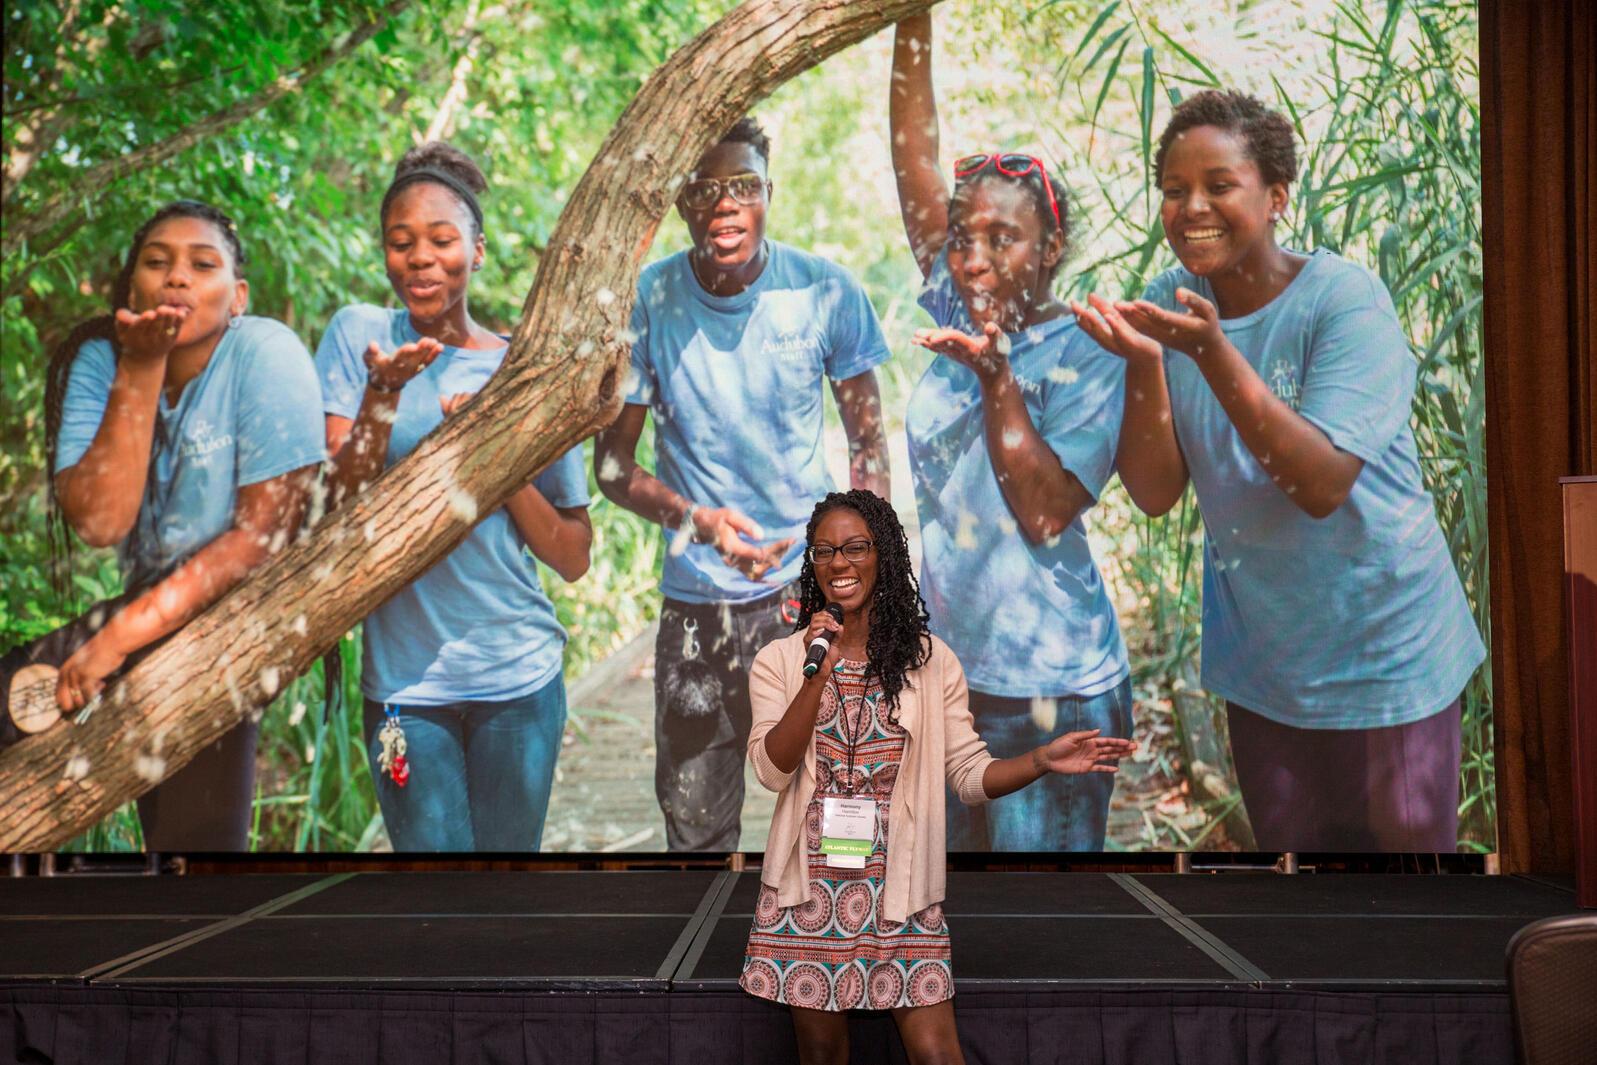 Harmony Hamilton speaks about her experiences as a storyteller in the 2017 Audubon Convention. Camilla Cerea/Audubon